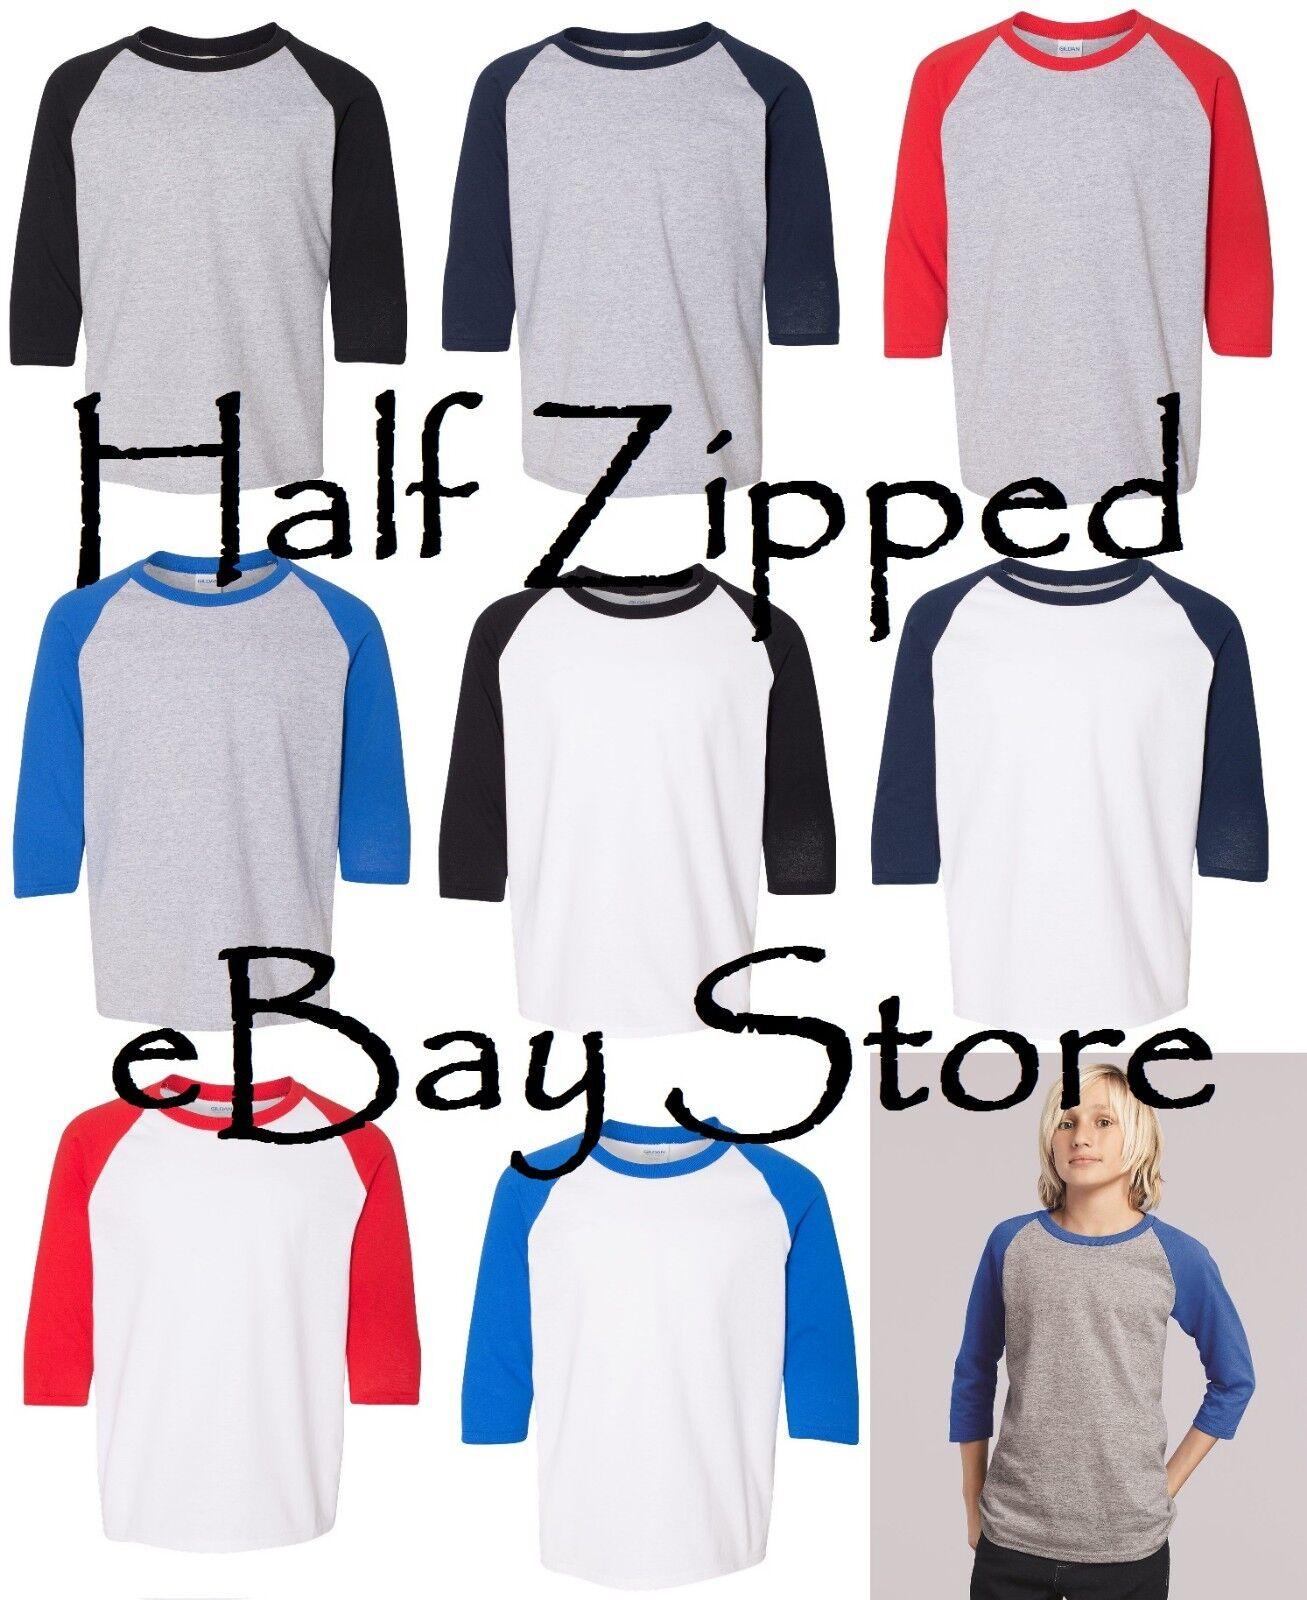 Gildan Heavy Cotton YOUTH Raglan Tee Baseball T-Shirt 5700B